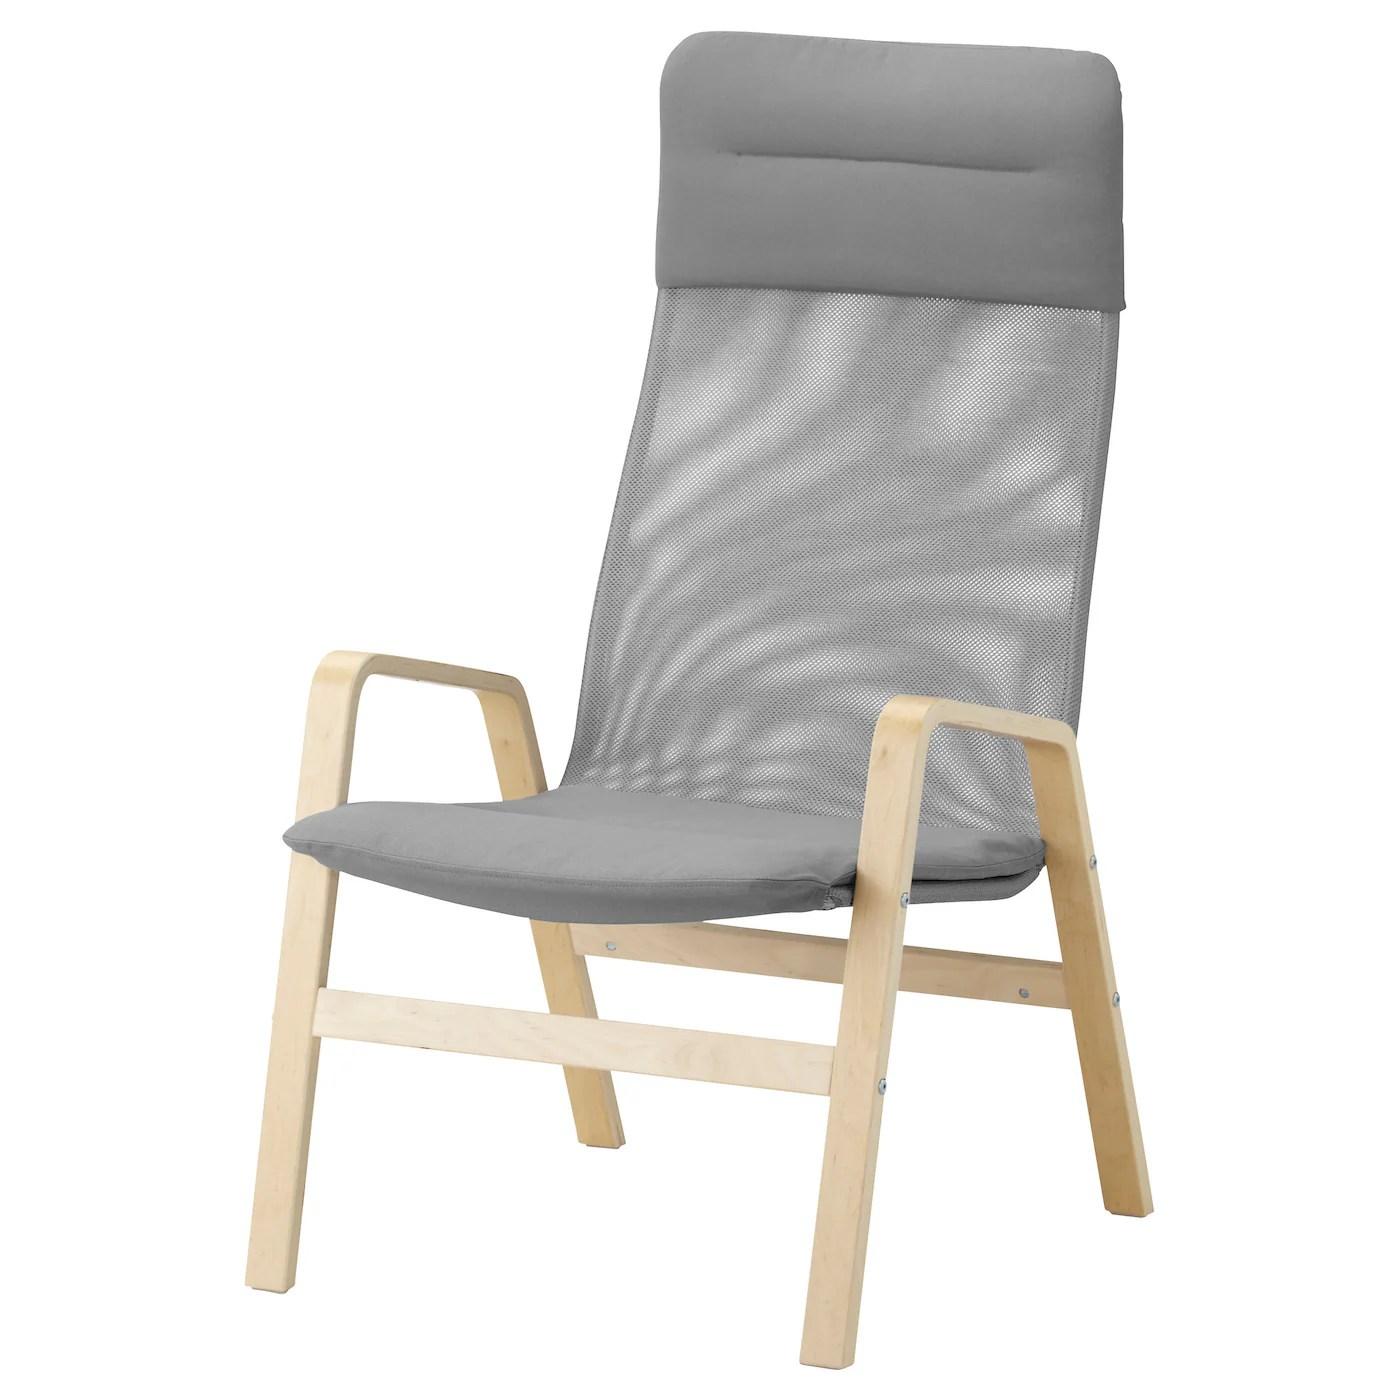 ikea high chairs la z boy office chair canada nolbyn back armchair birch veneer grey